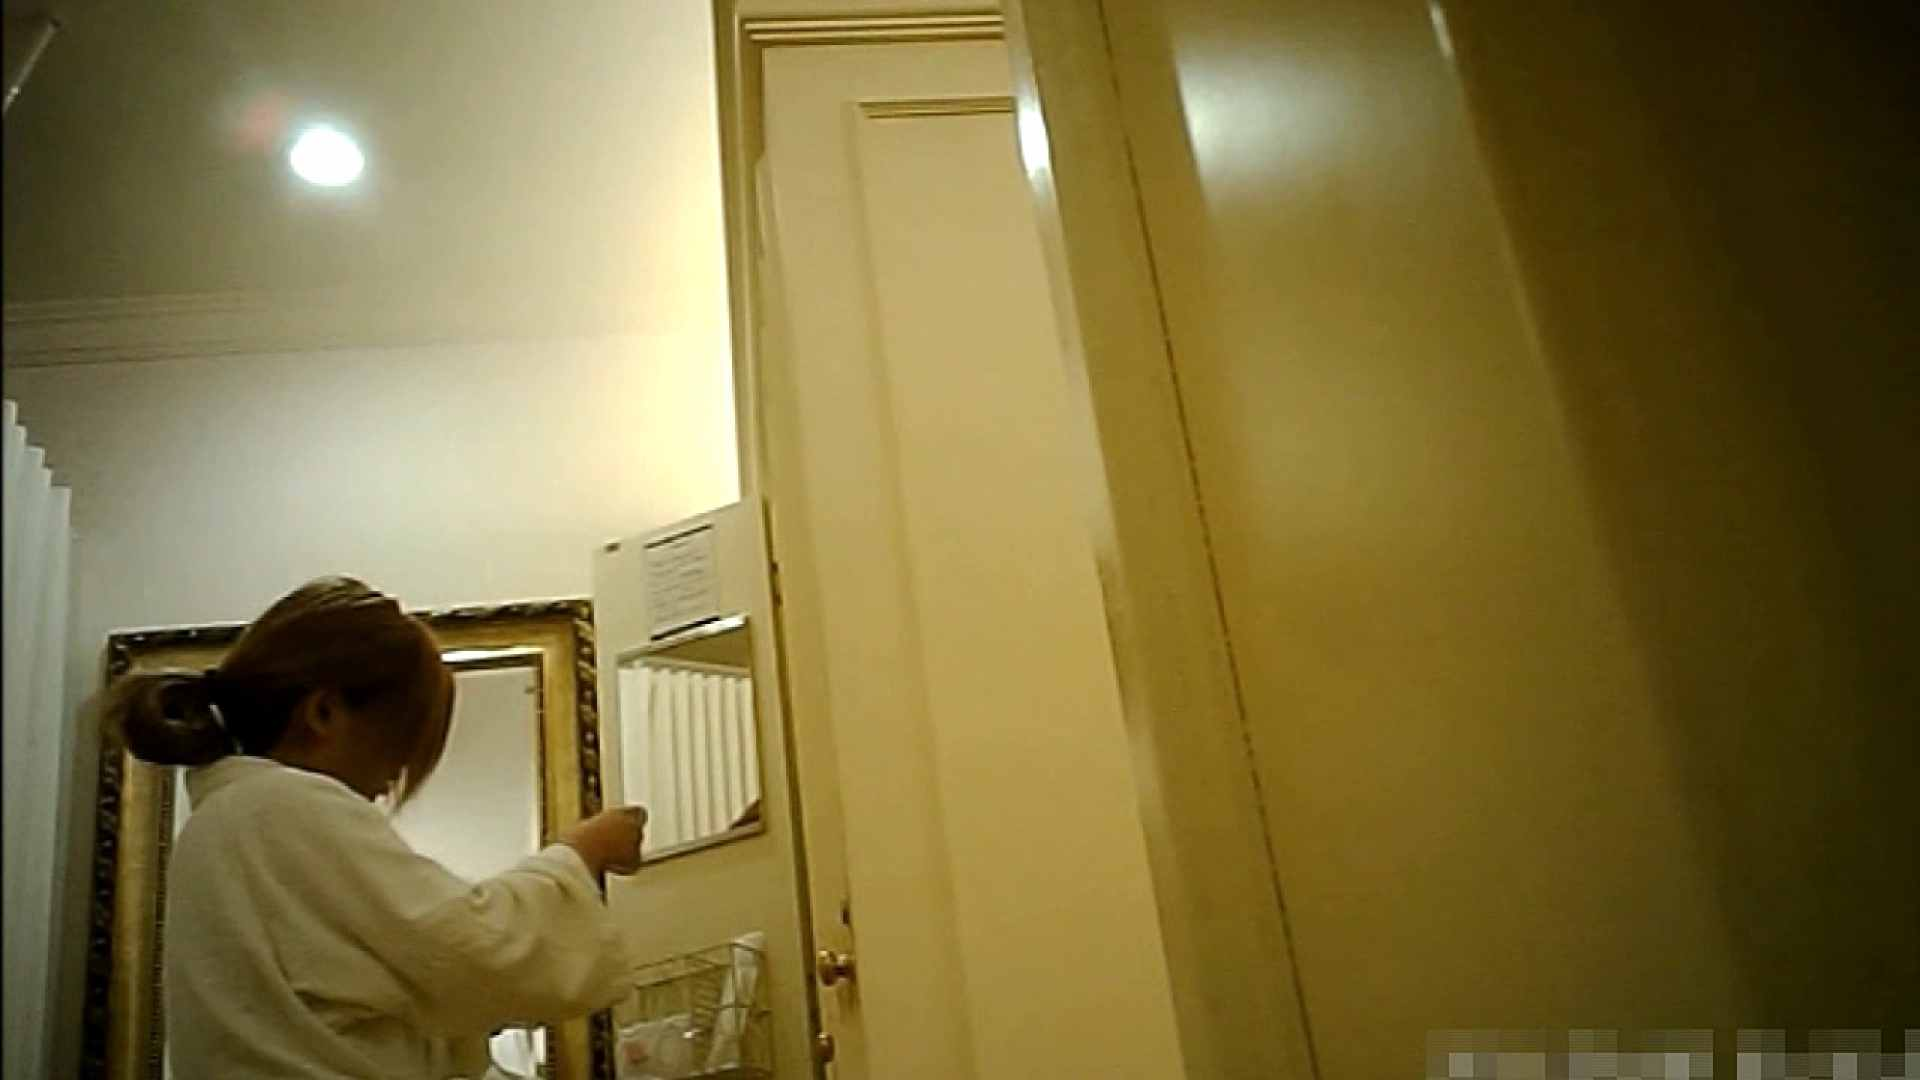 vol.7 【Mちゃん(入浴)】ブランド品査定士19歳 巨乳ギャル イタズラ エロ画像 64画像 22